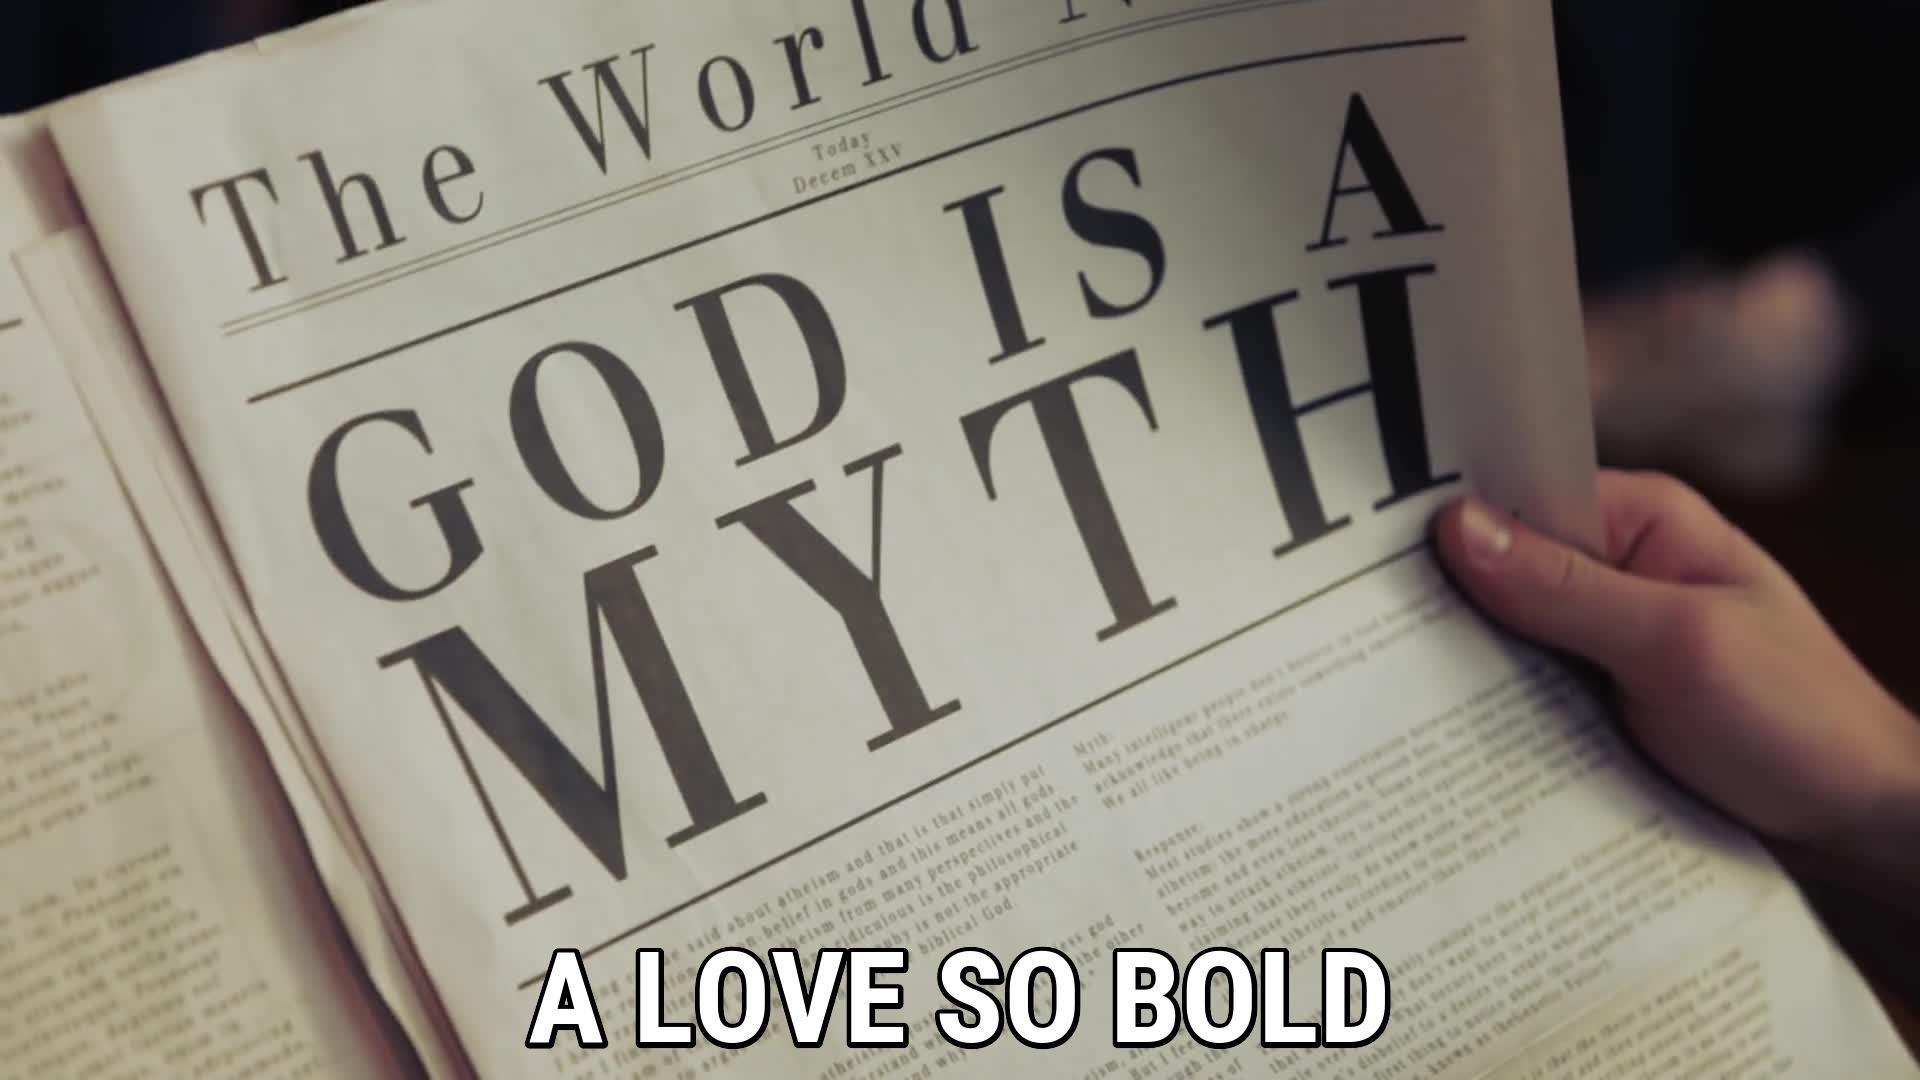 A love so bold